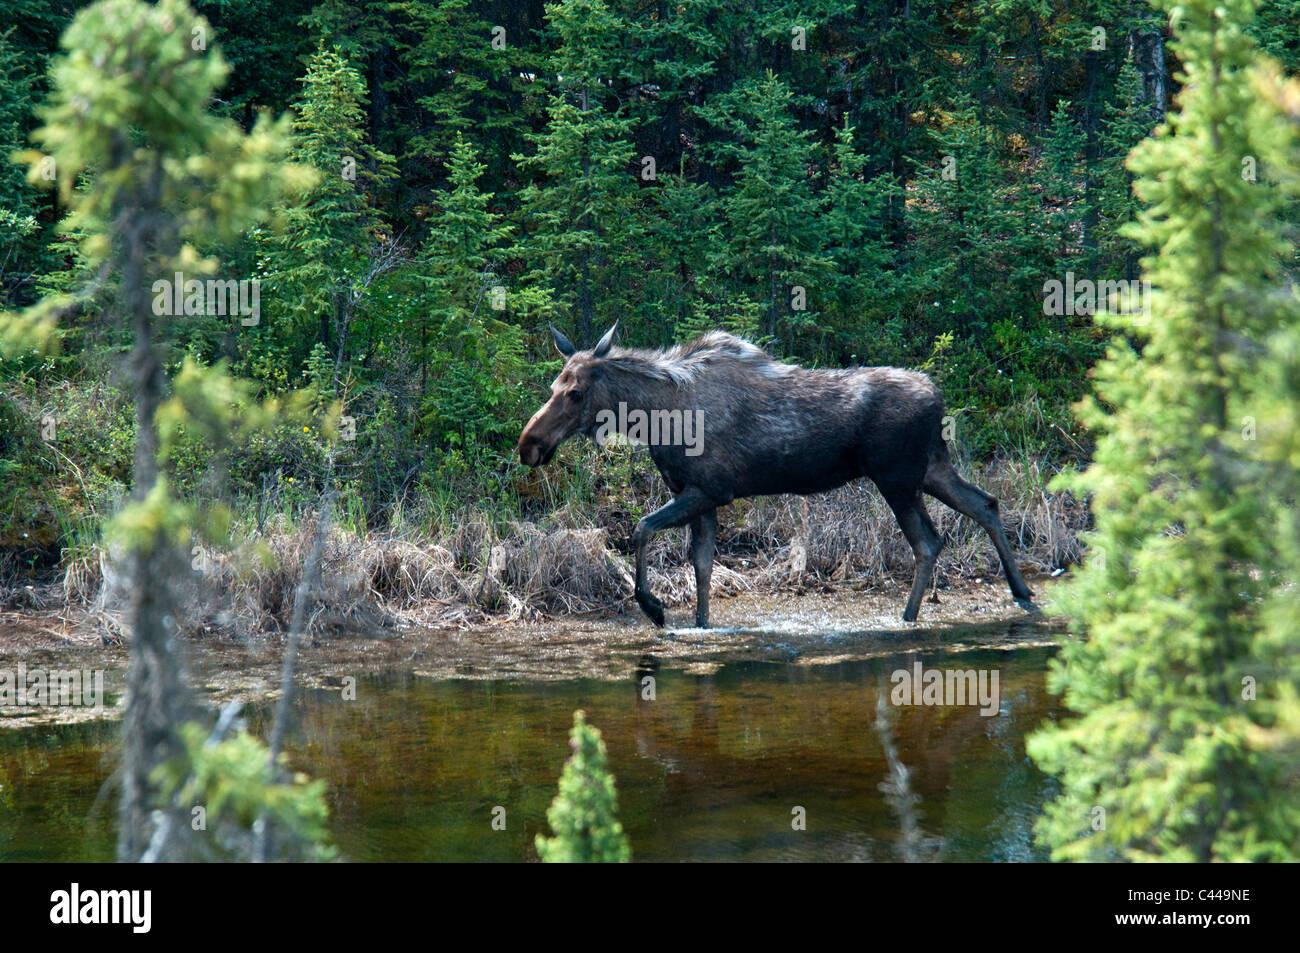 moose, alces alces, along Alaska Highway, took cutoff road, may, animal, pond, USA, North America, Alaska, wood - Stock Image